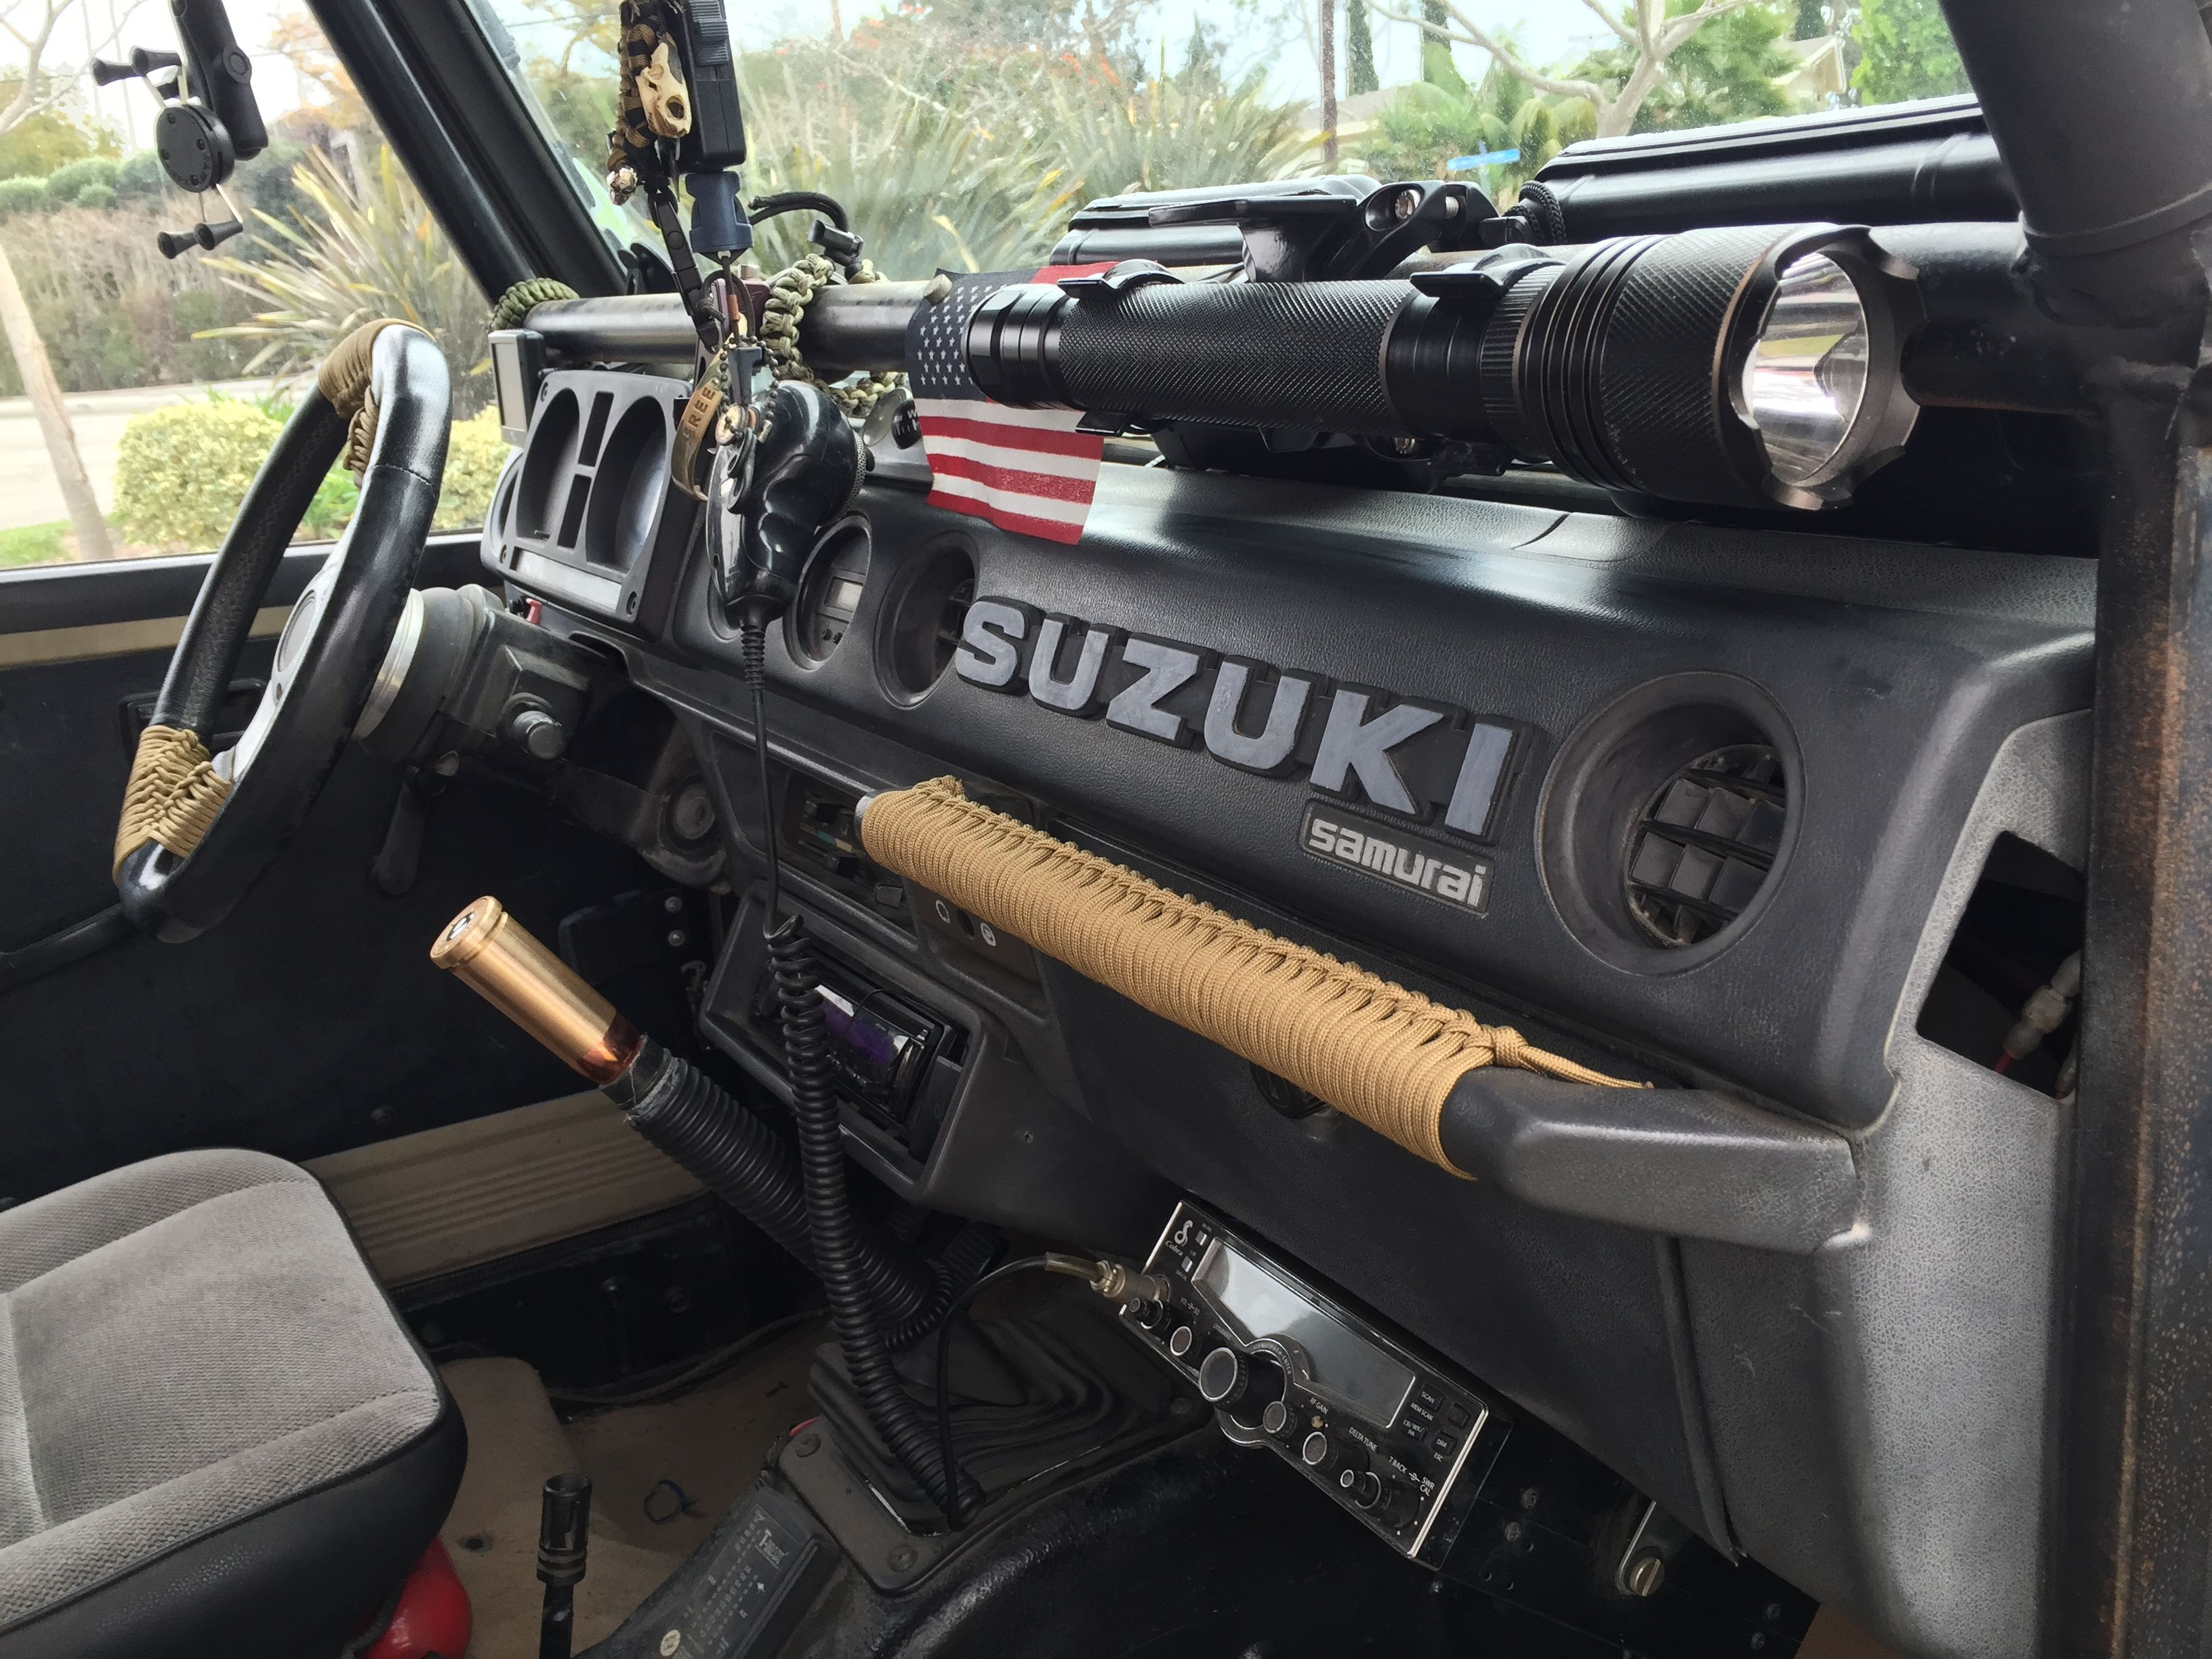 Paracord Use Suzuki Samurai With Images Suzuki Samurai Suzuki